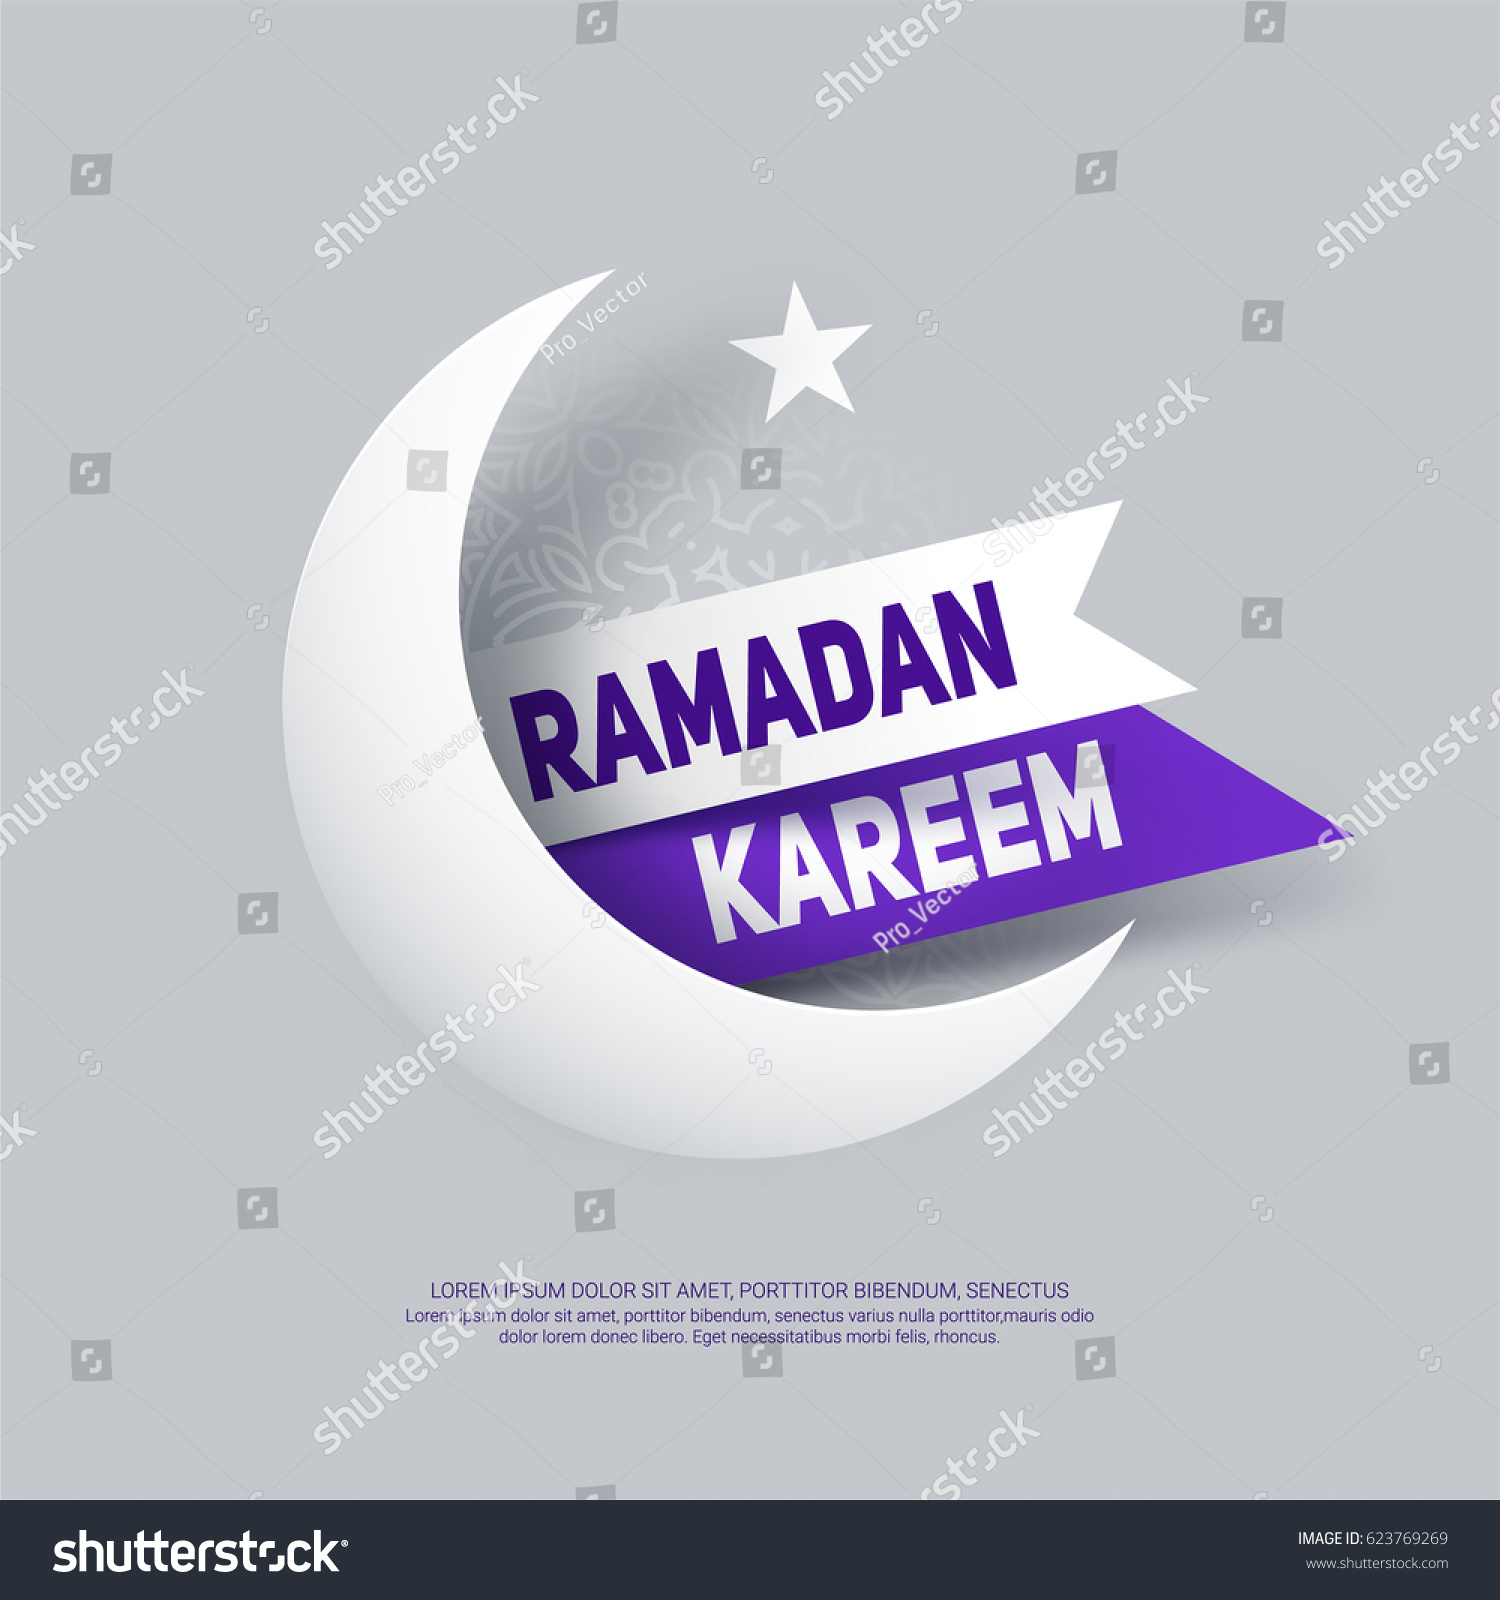 Ramadan kareem greeting card paper crescent stock vector 623769269 ramadan kareem greeting card with paper crescent moon star and ribbon eps 10 kristyandbryce Image collections